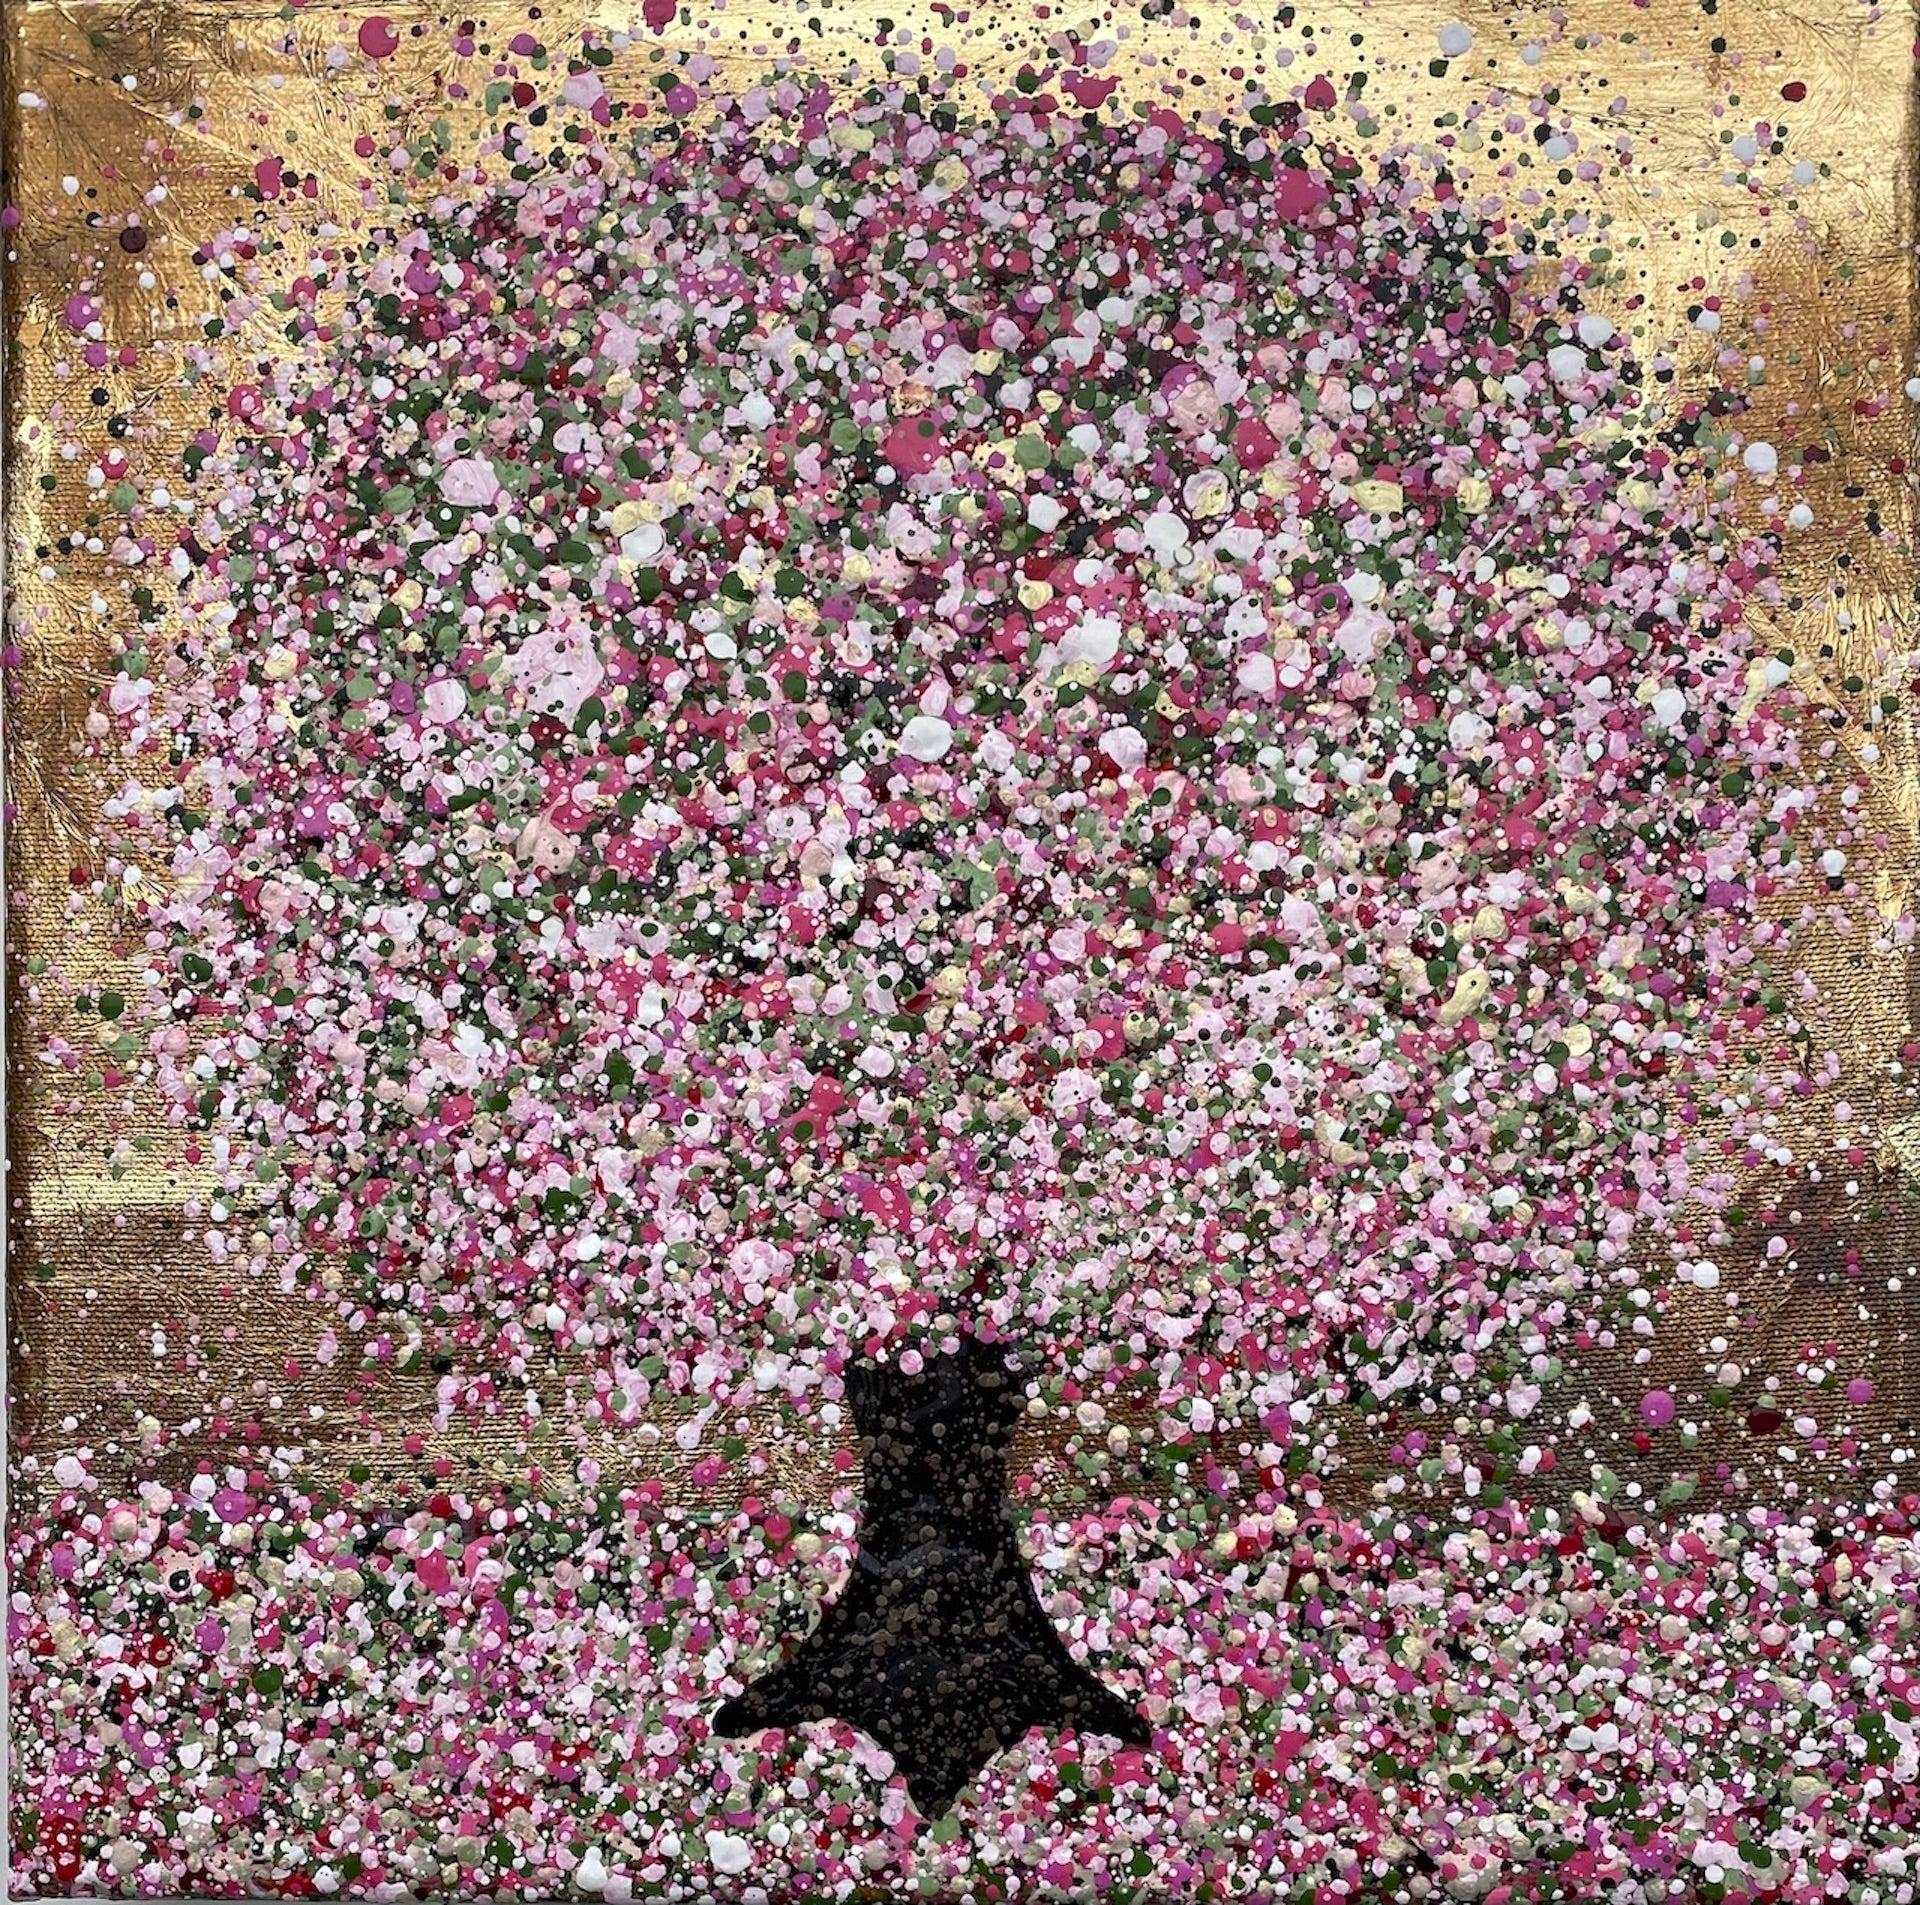 Nicky Chubb, Everlasting Cherry Blossom II, Contemporary Art, Affordable Art